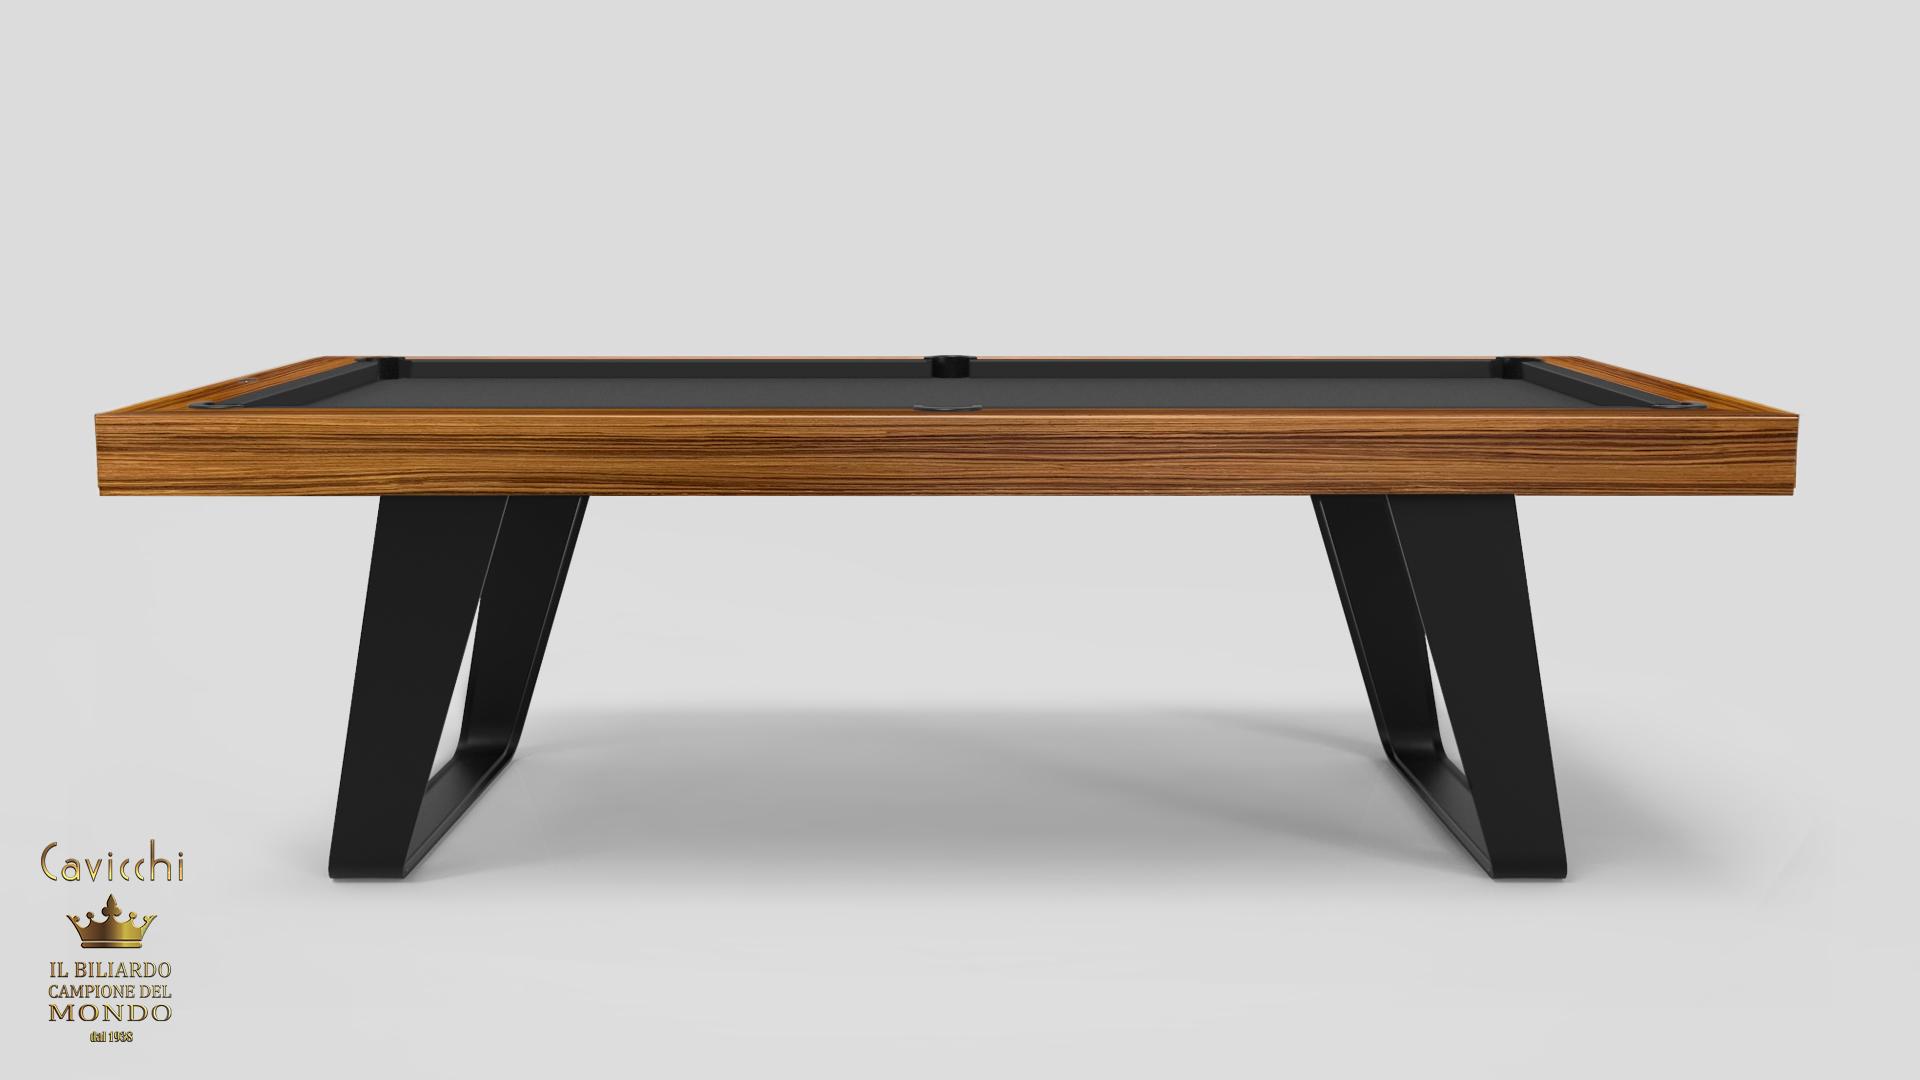 Chimera Pool Table Teak / Walnut / Lacquered 4